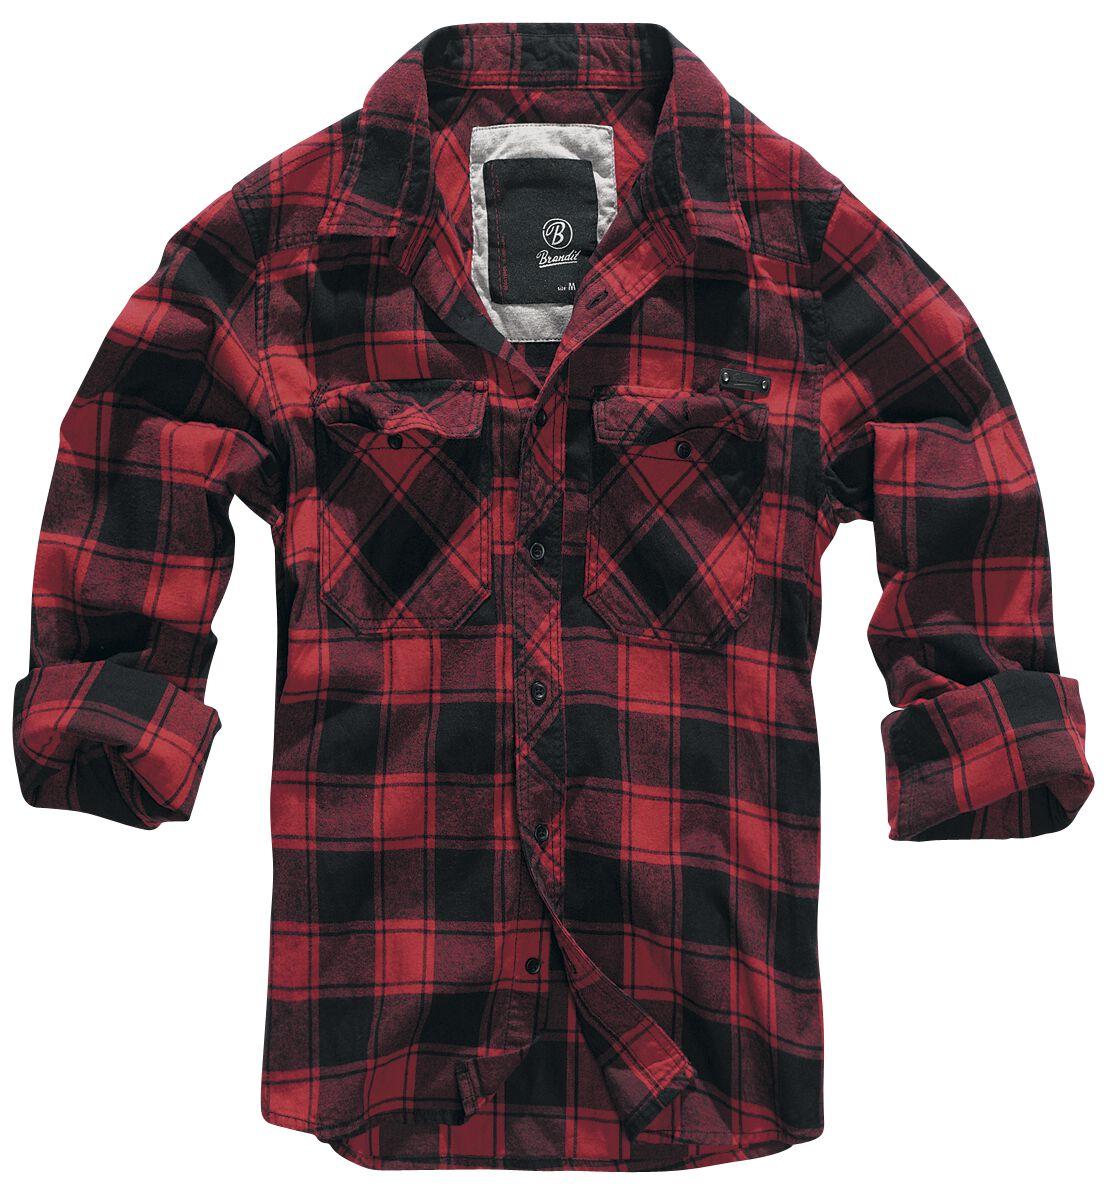 Image of   Brandit Checkshirt Skjorte rød-sort